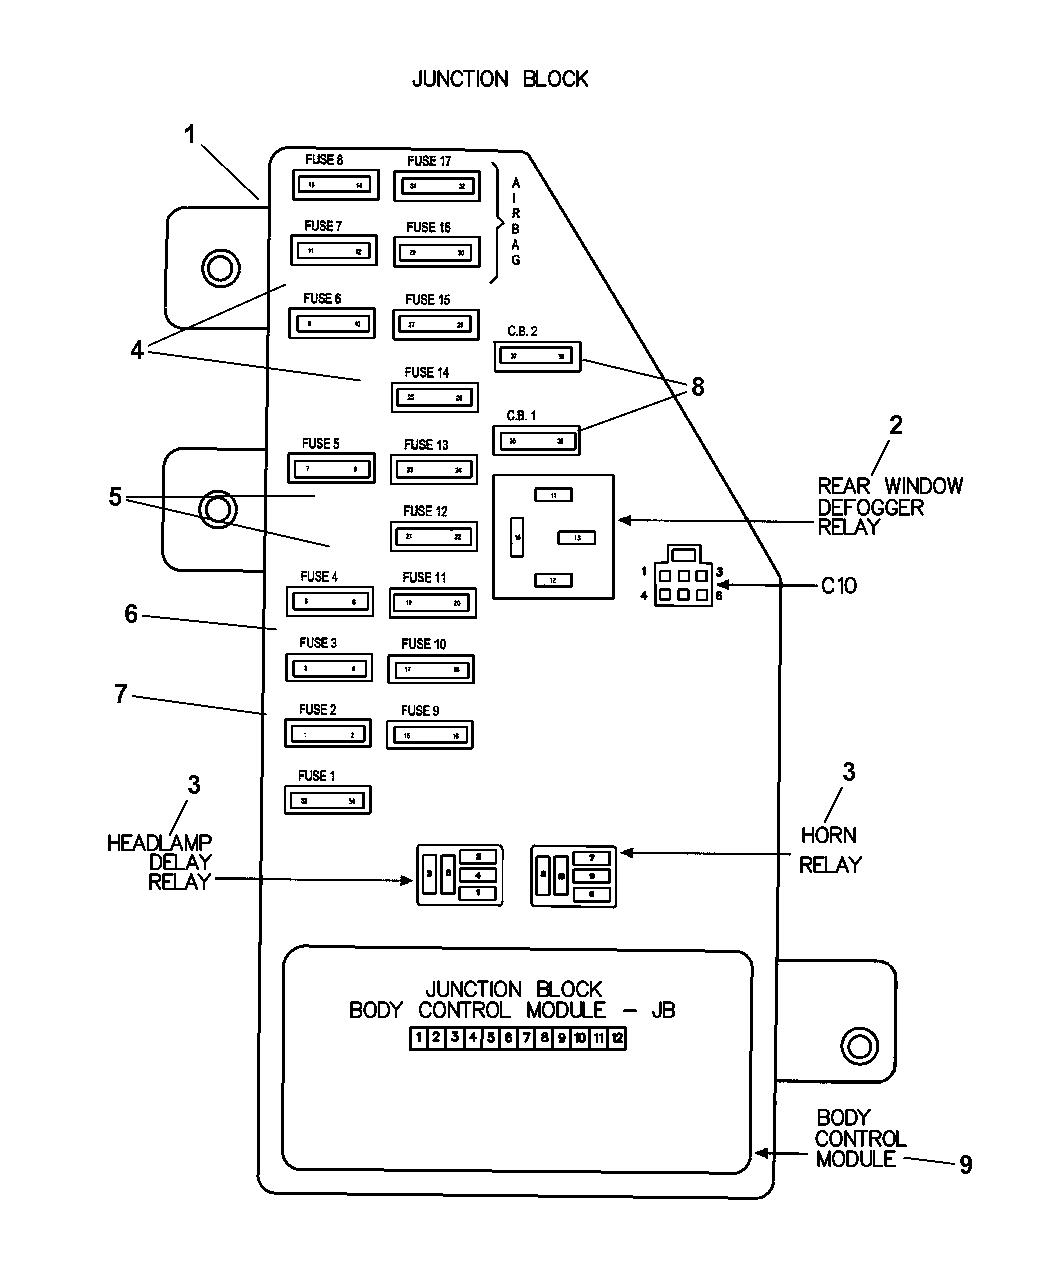 fuse box diagram for 2003 dodge stratus 7f11 2003 dodge stratus fuse diagram wiring library  7f11 2003 dodge stratus fuse diagram